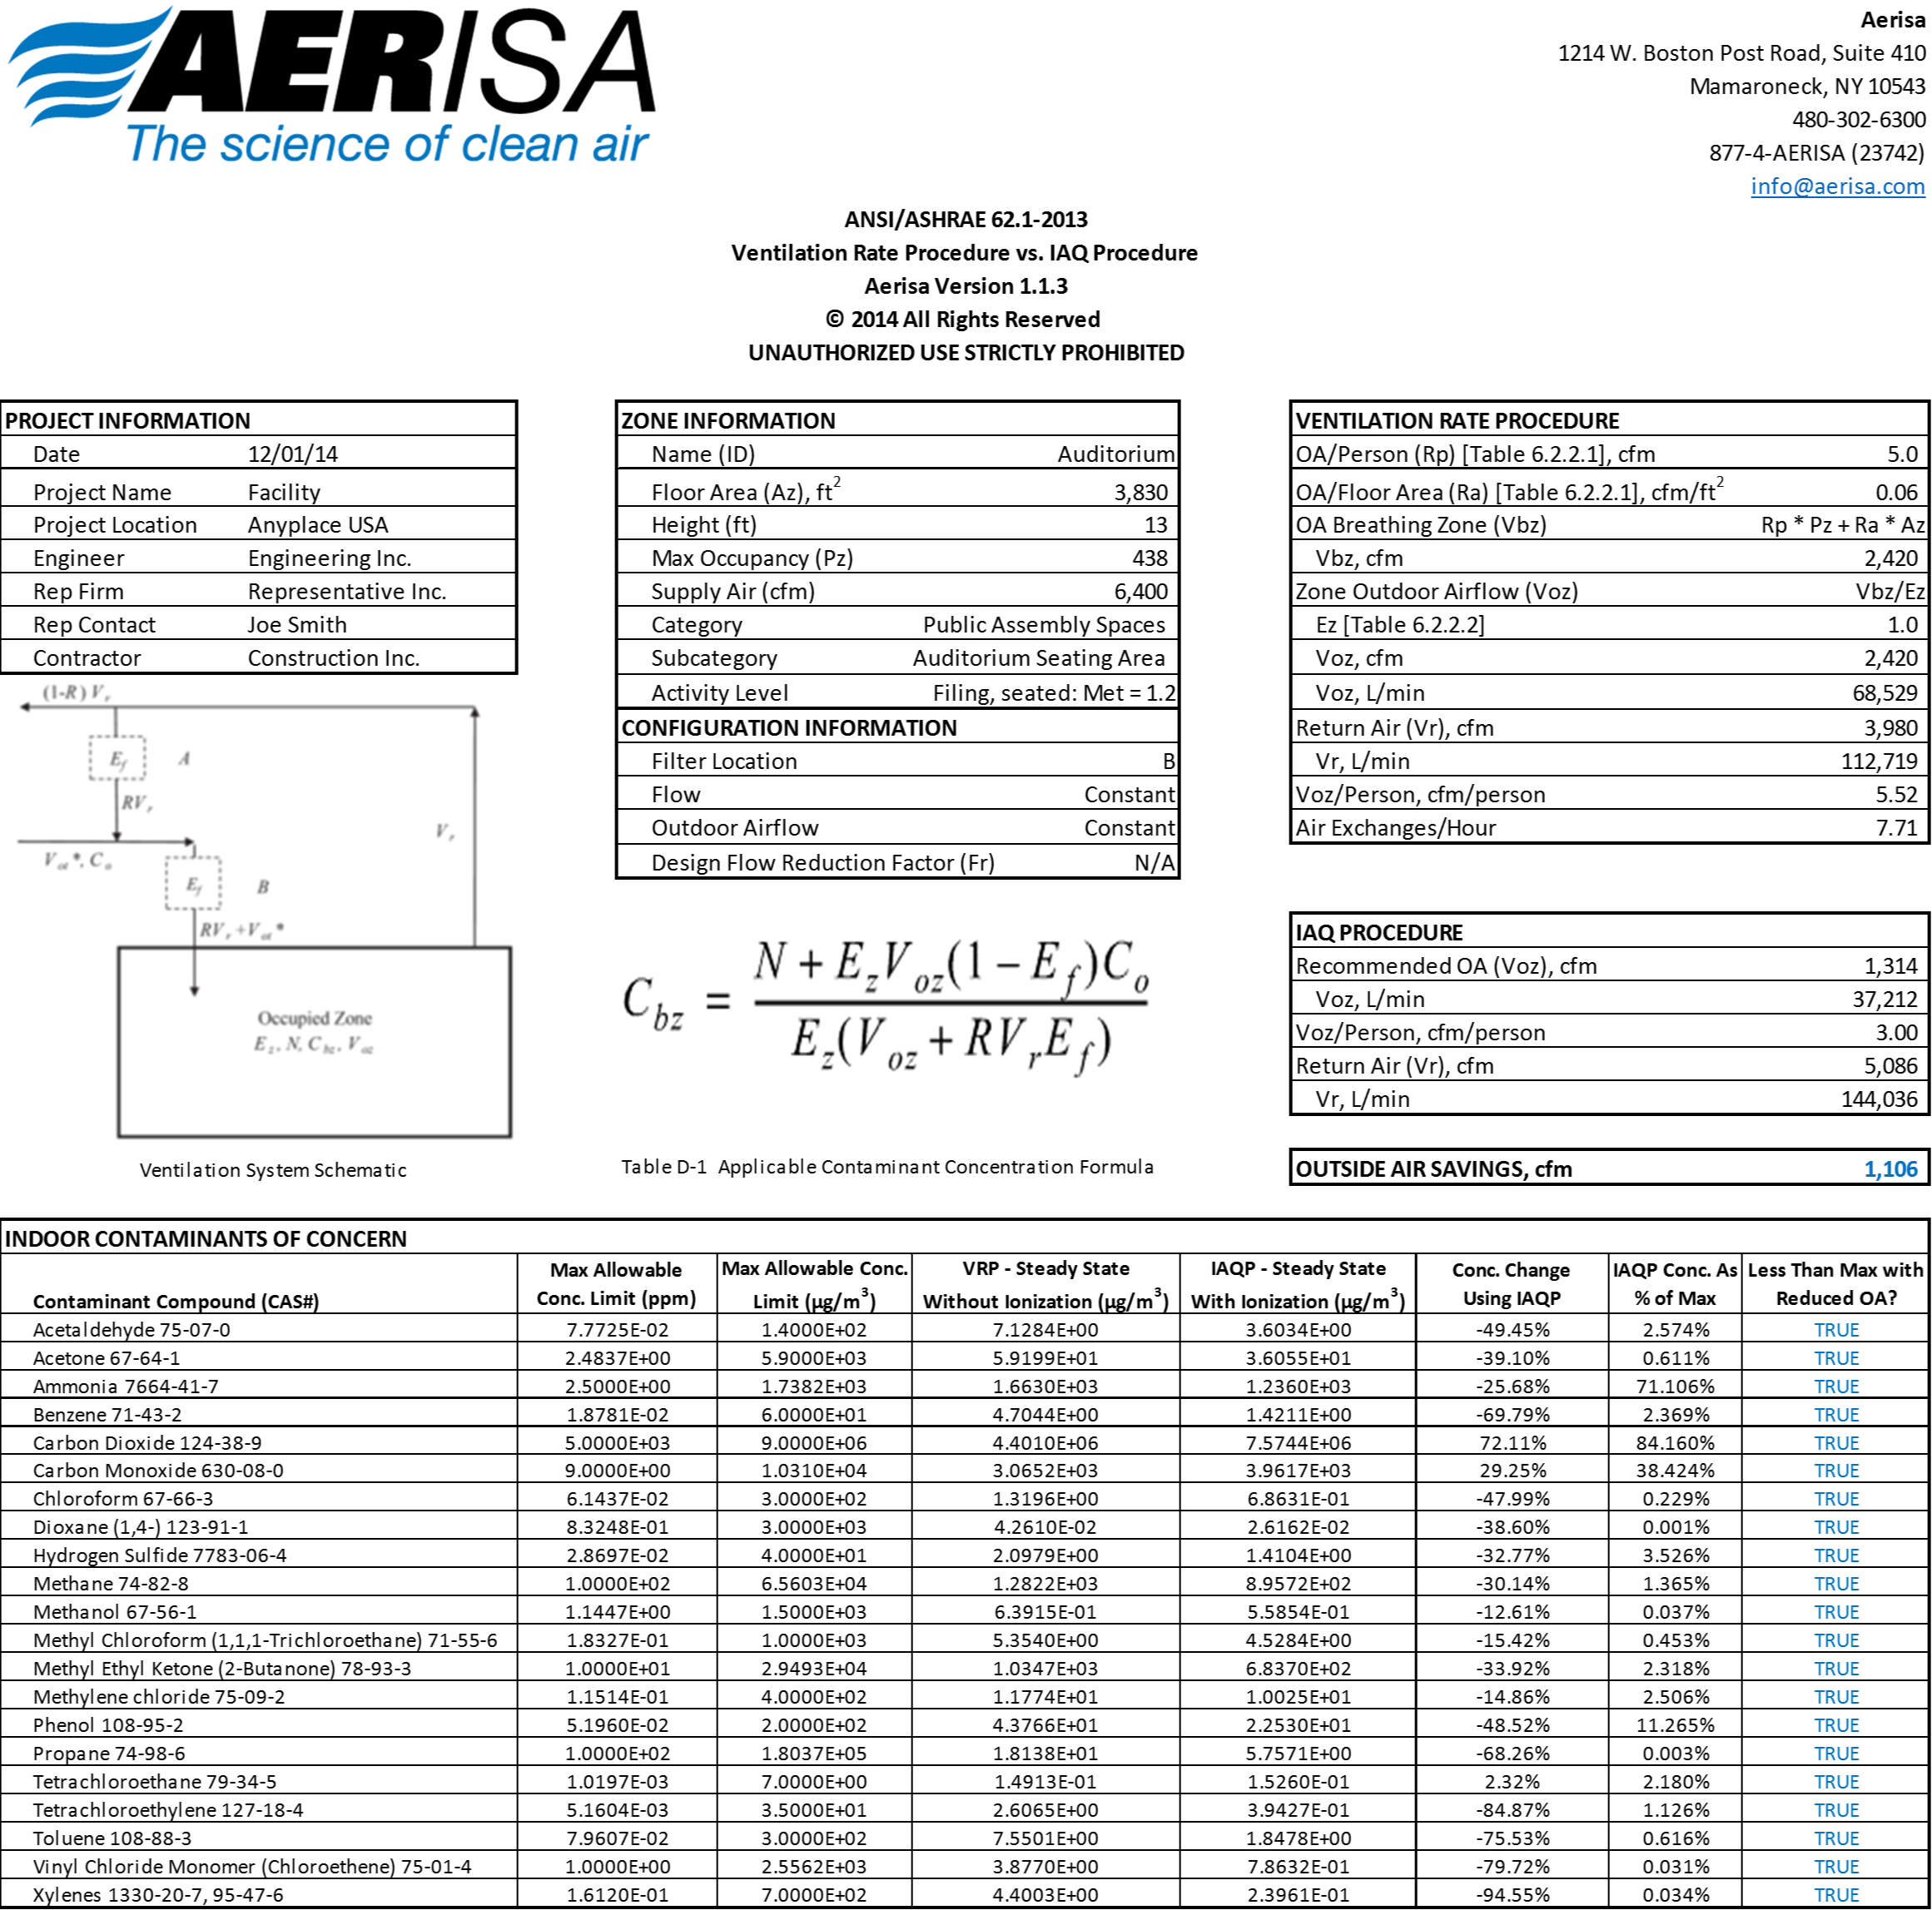 Ashrae 62.1 Ventilation Spreadsheet In Outside Air Reduction  Aerisa